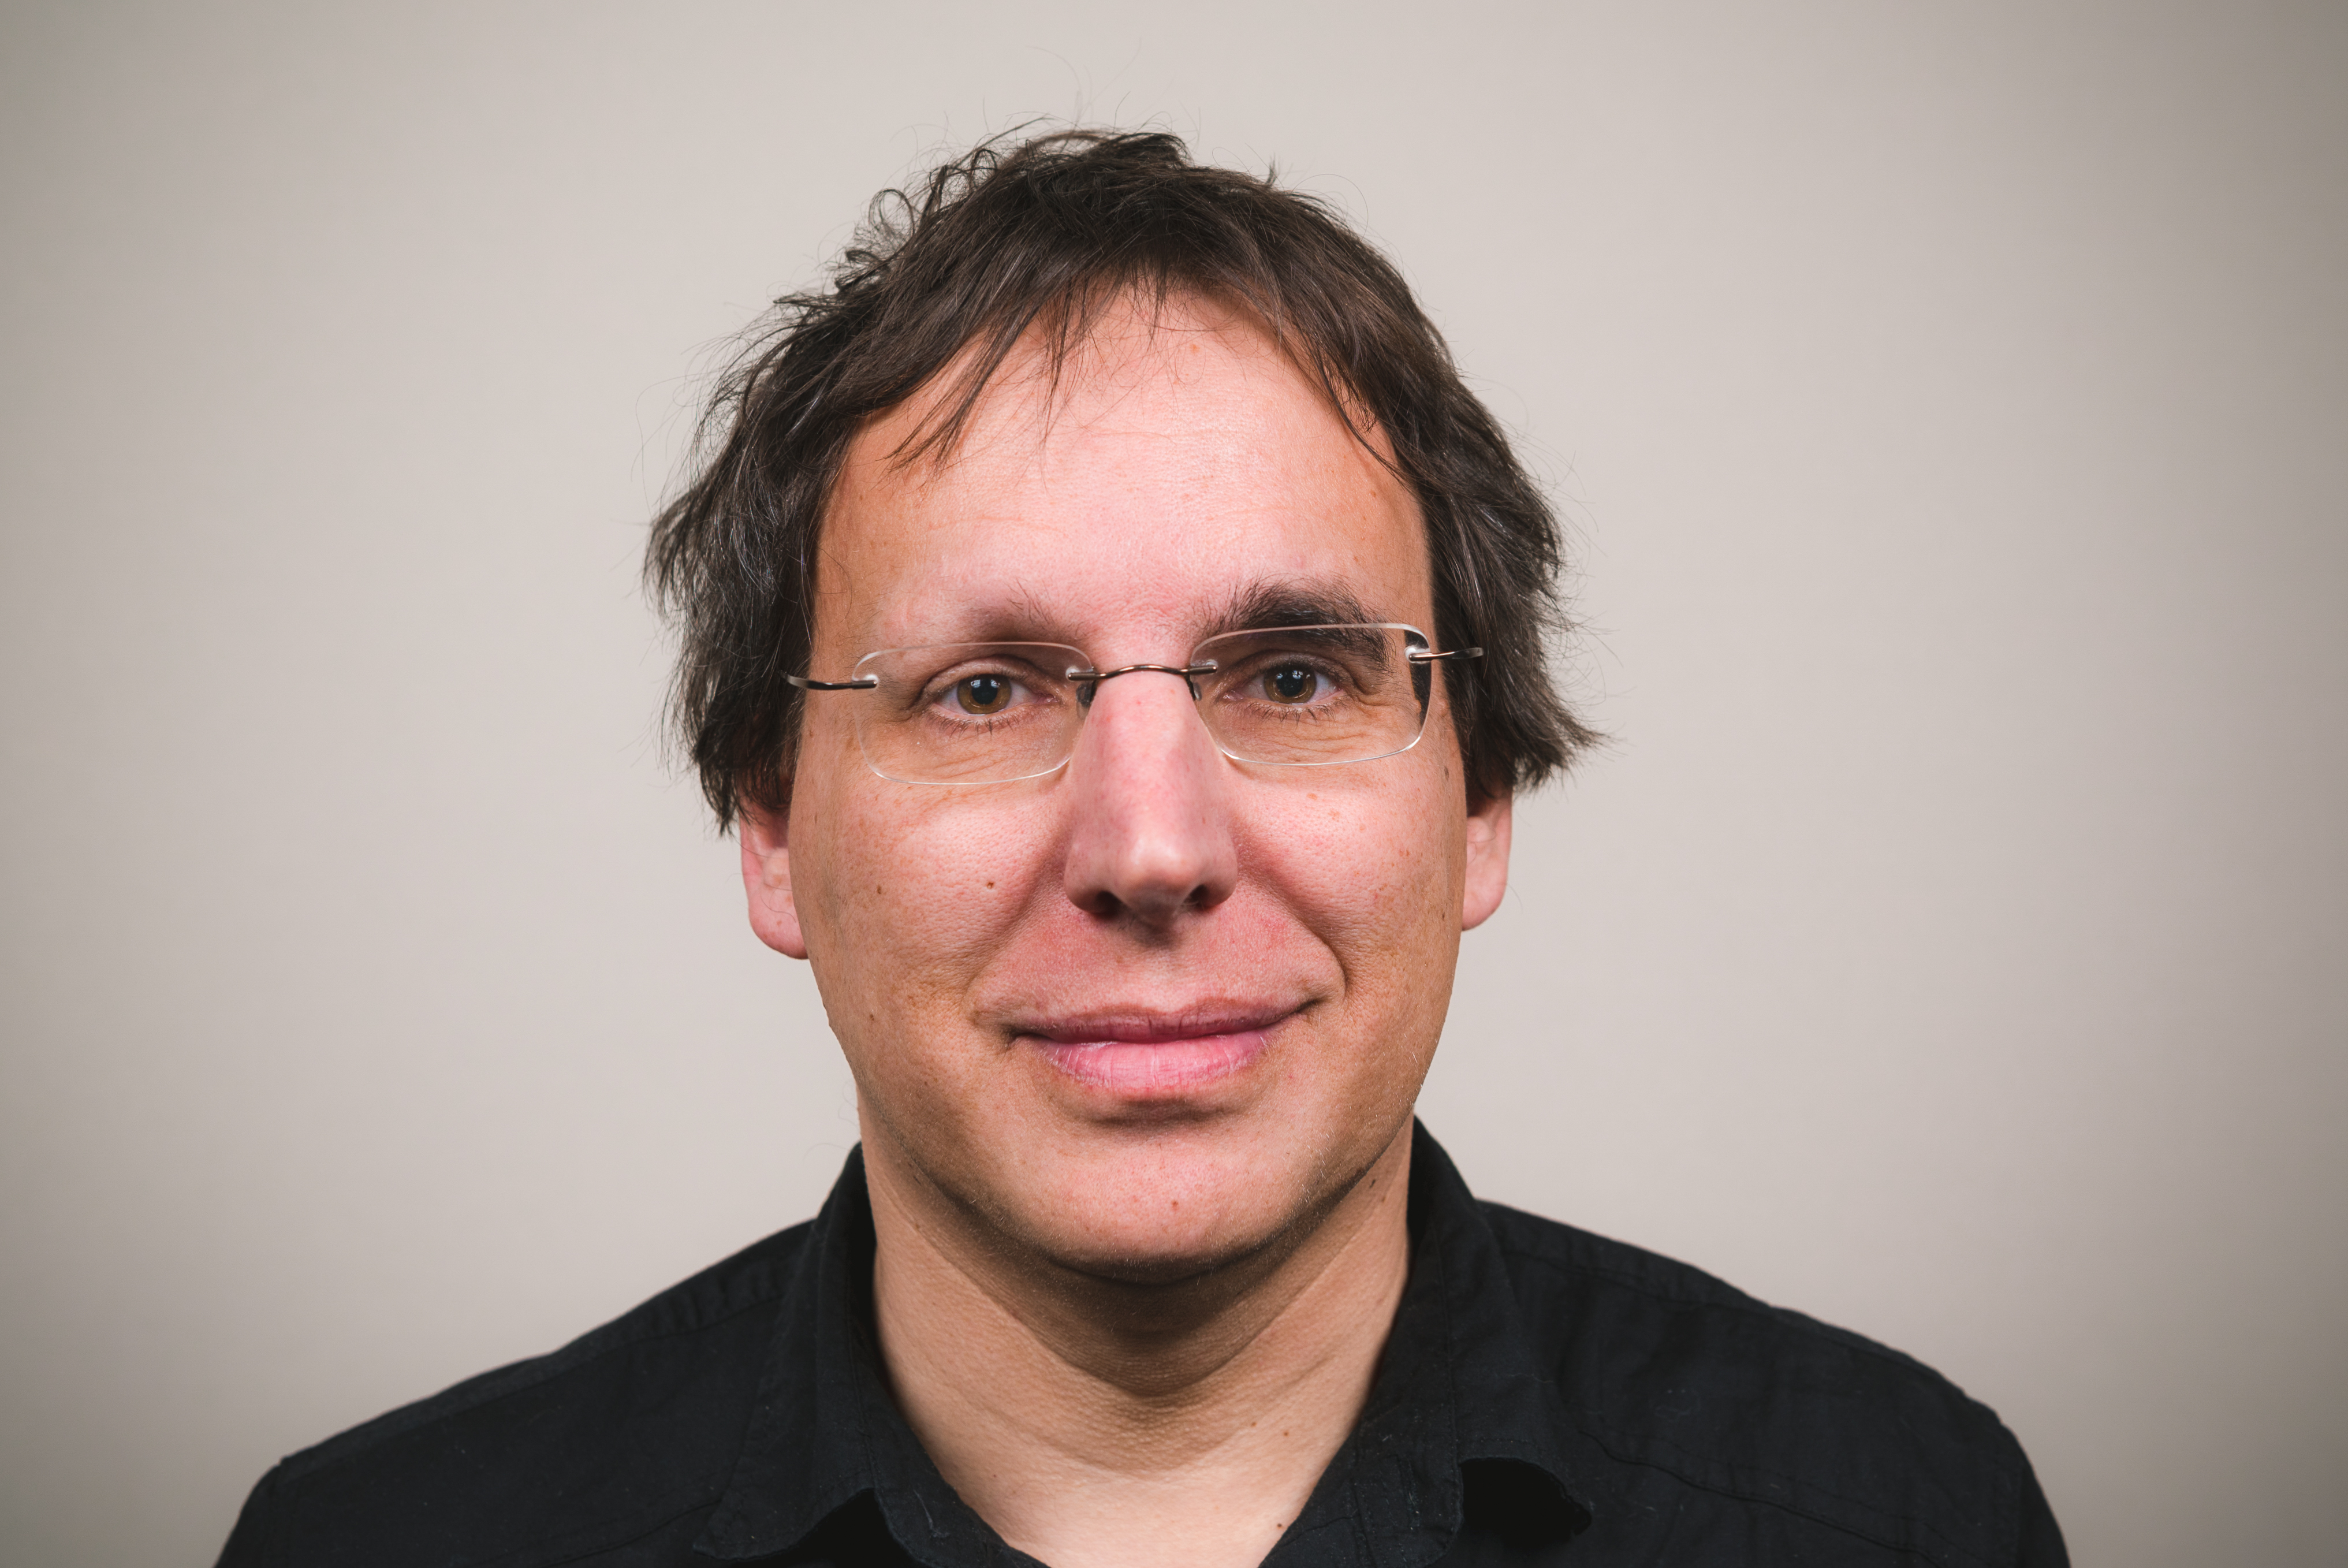 Tijs Krammer